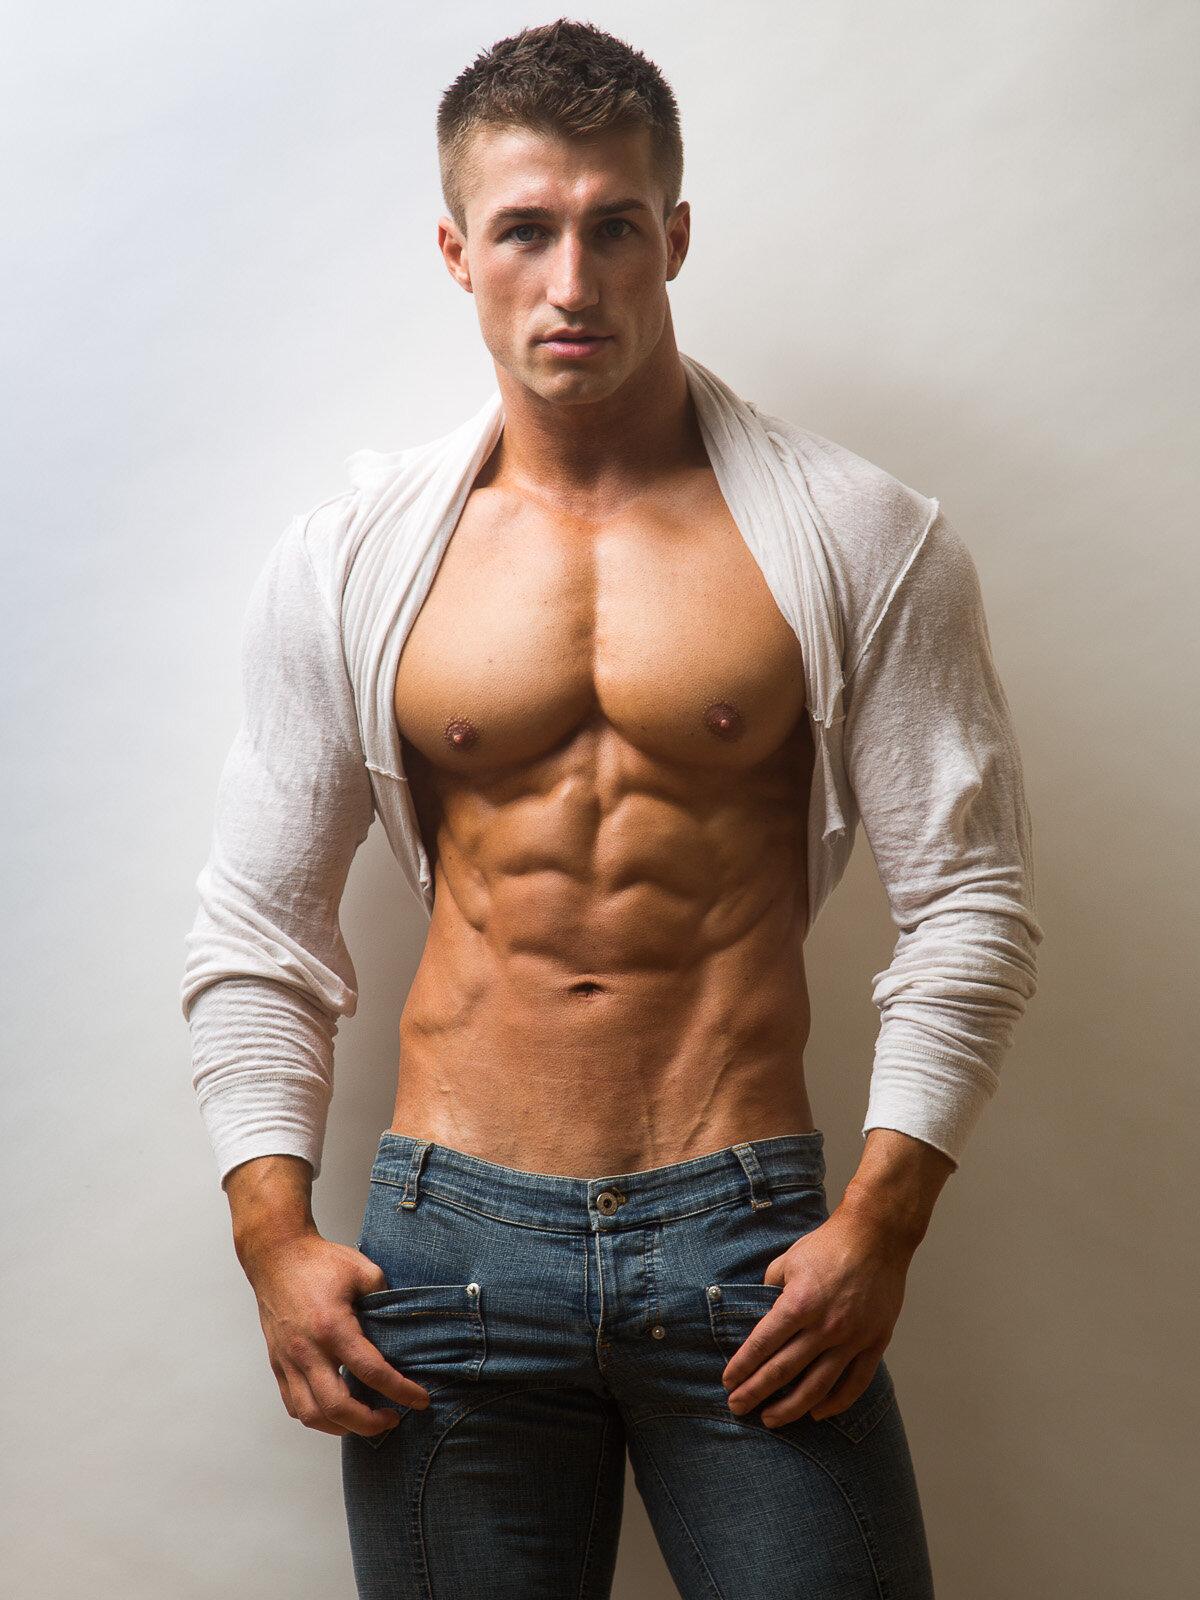 аудитория, картинка мускулистый парень был разочарован, когда